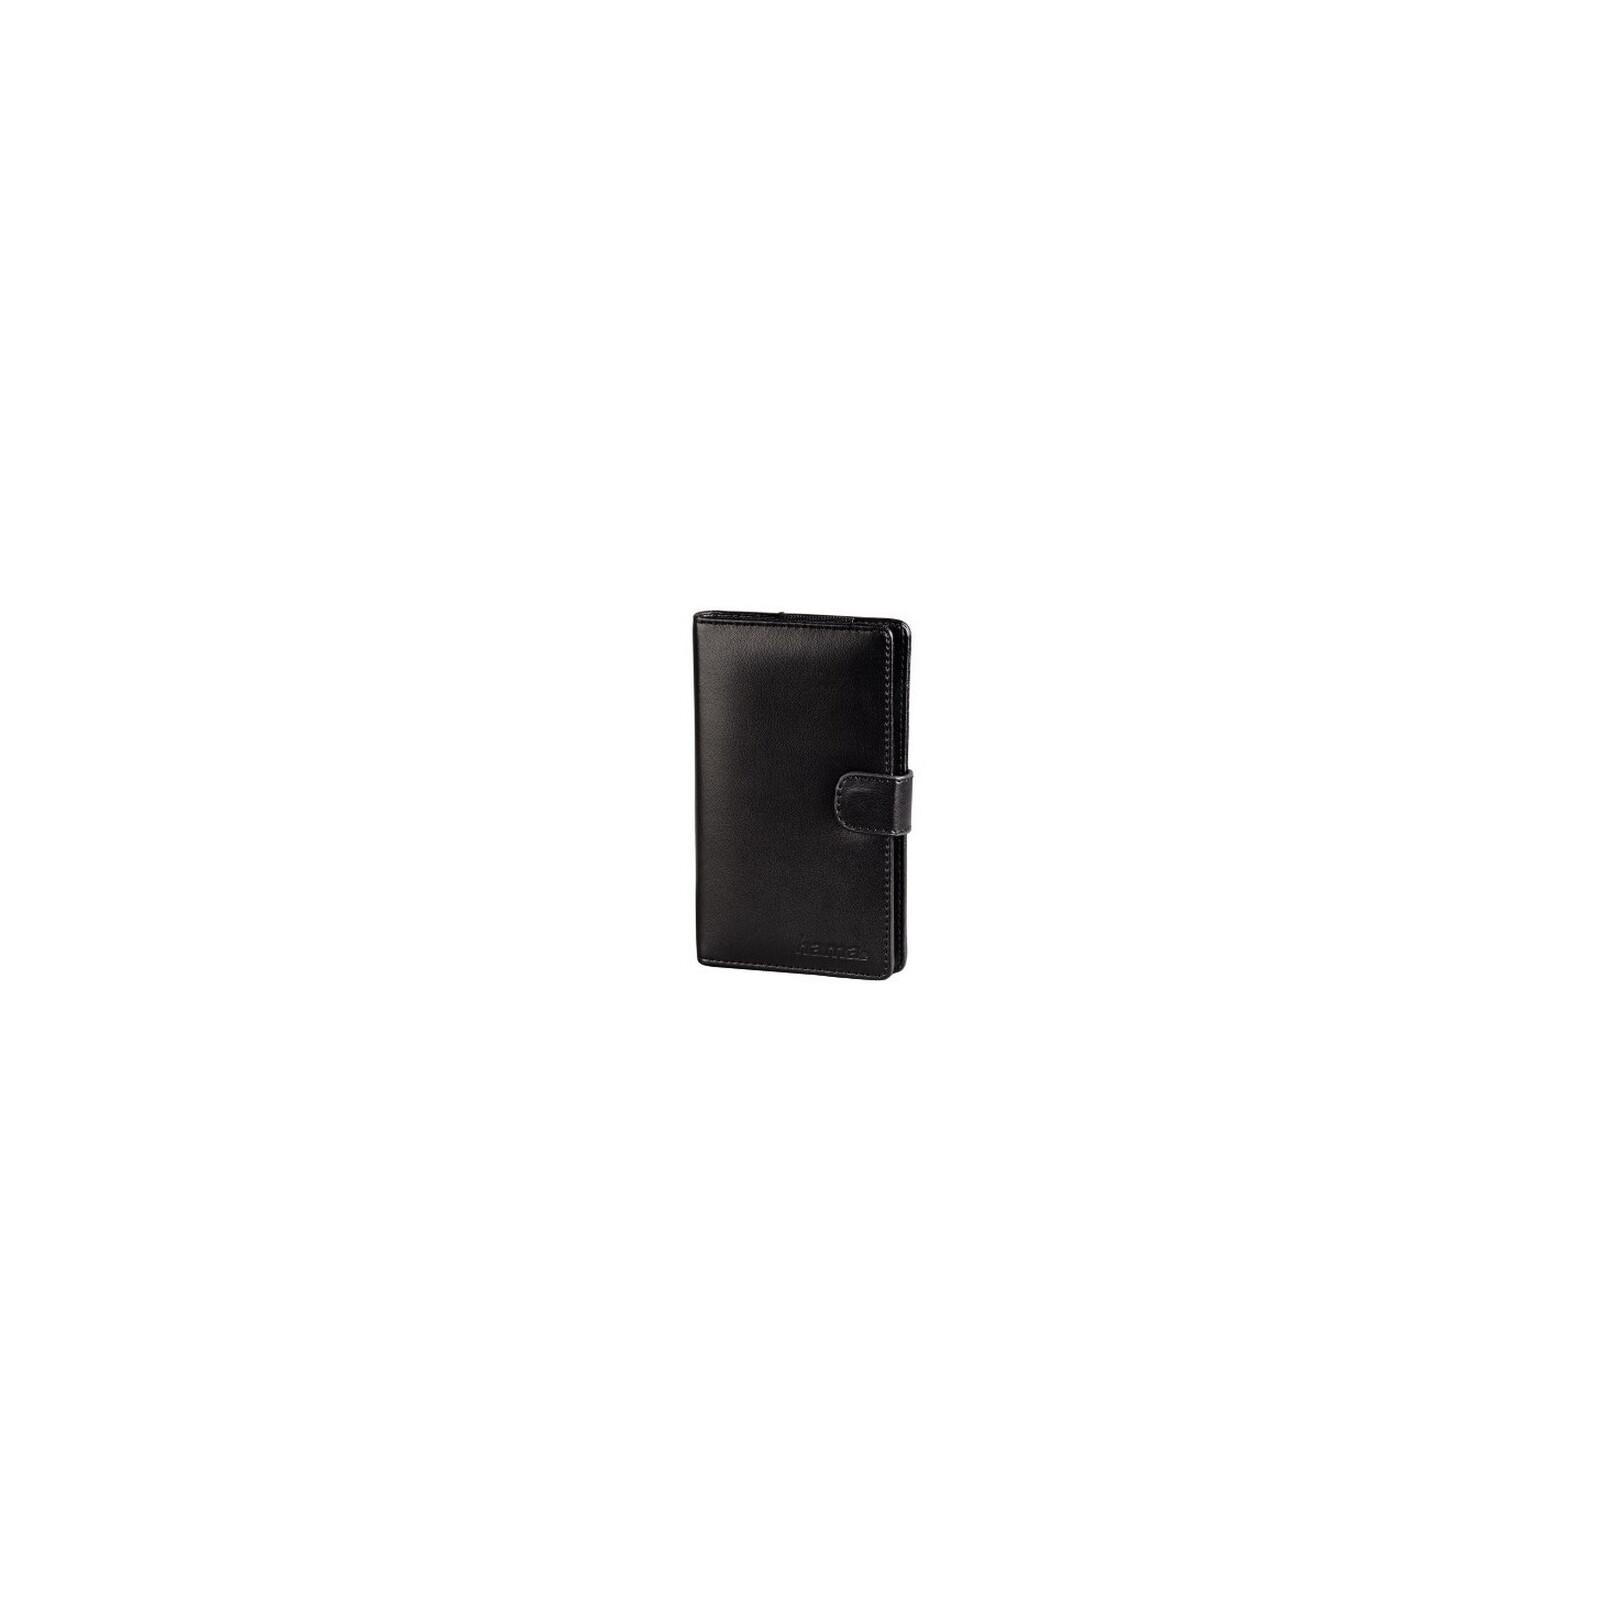 Hama 84409 USB-Stick-Case Vegas 5 USB-Sticks Schwarz